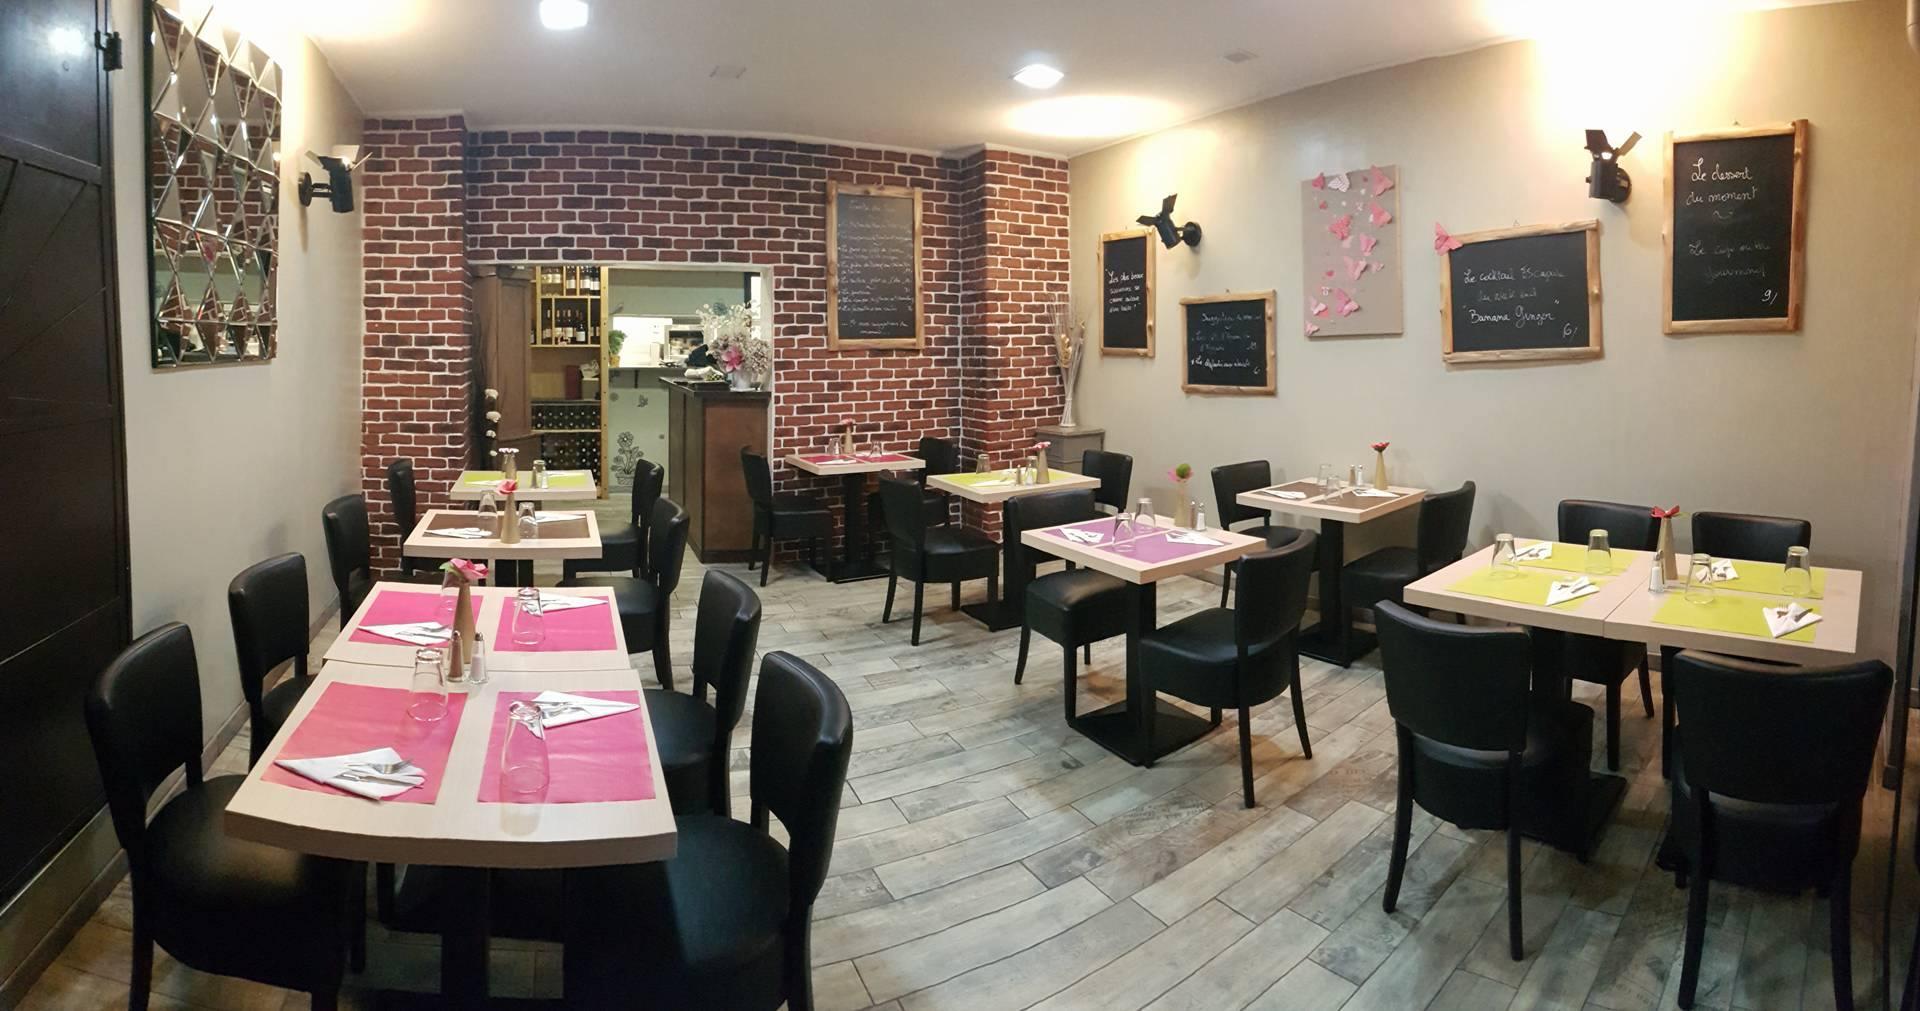 Restaurant l 39 escapade salon de provence - Msa salon de provence horaire ...